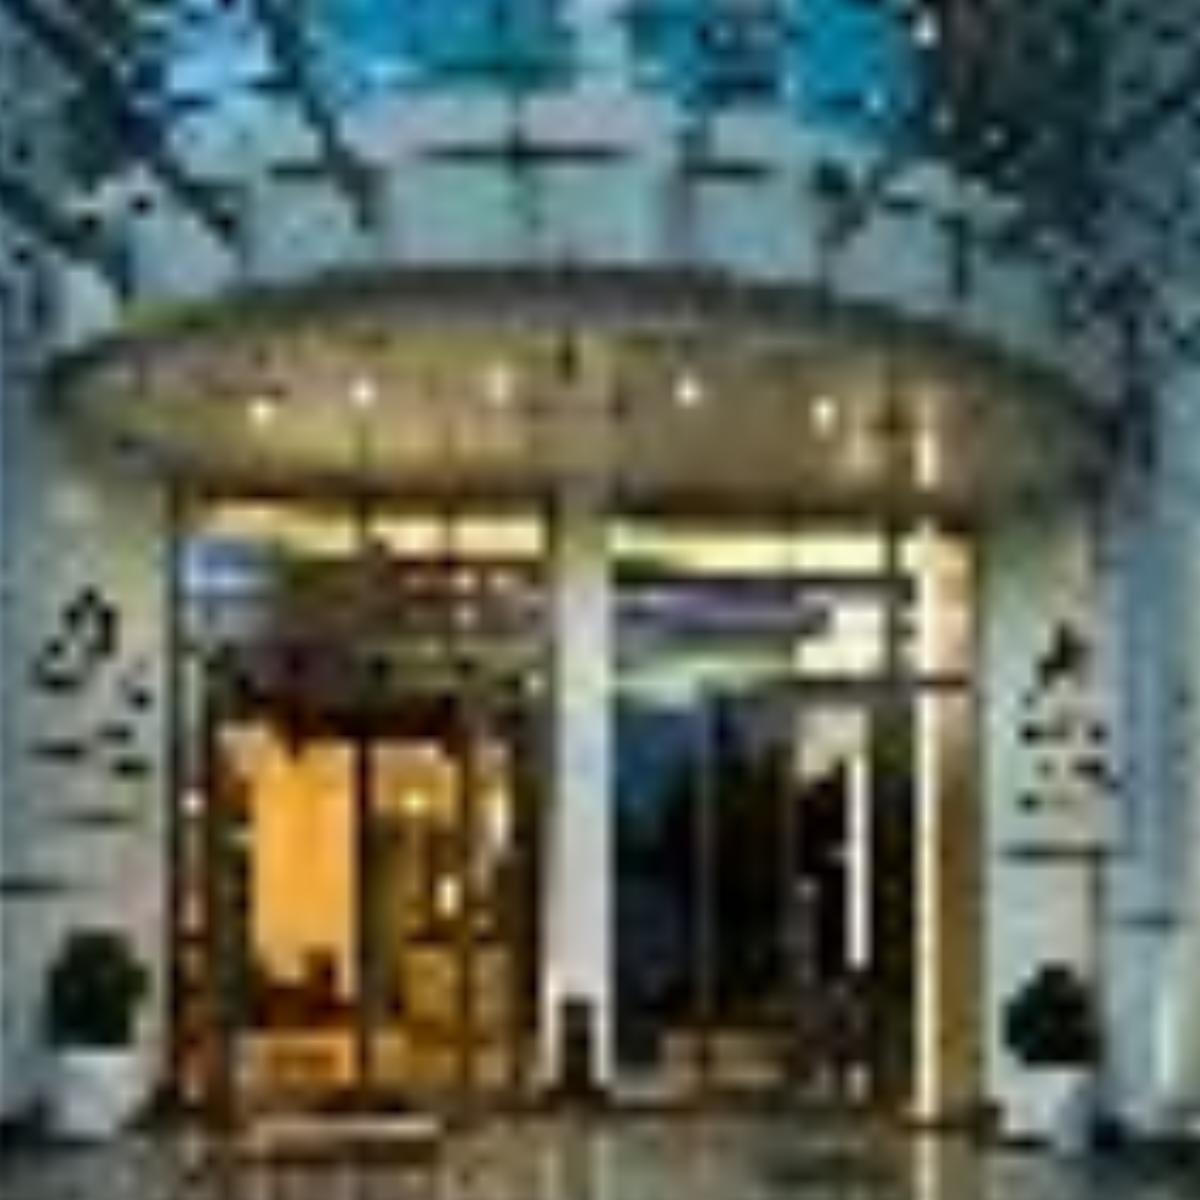 Qafqaz Baku City Hotel And Residences Hotel Baku Overview